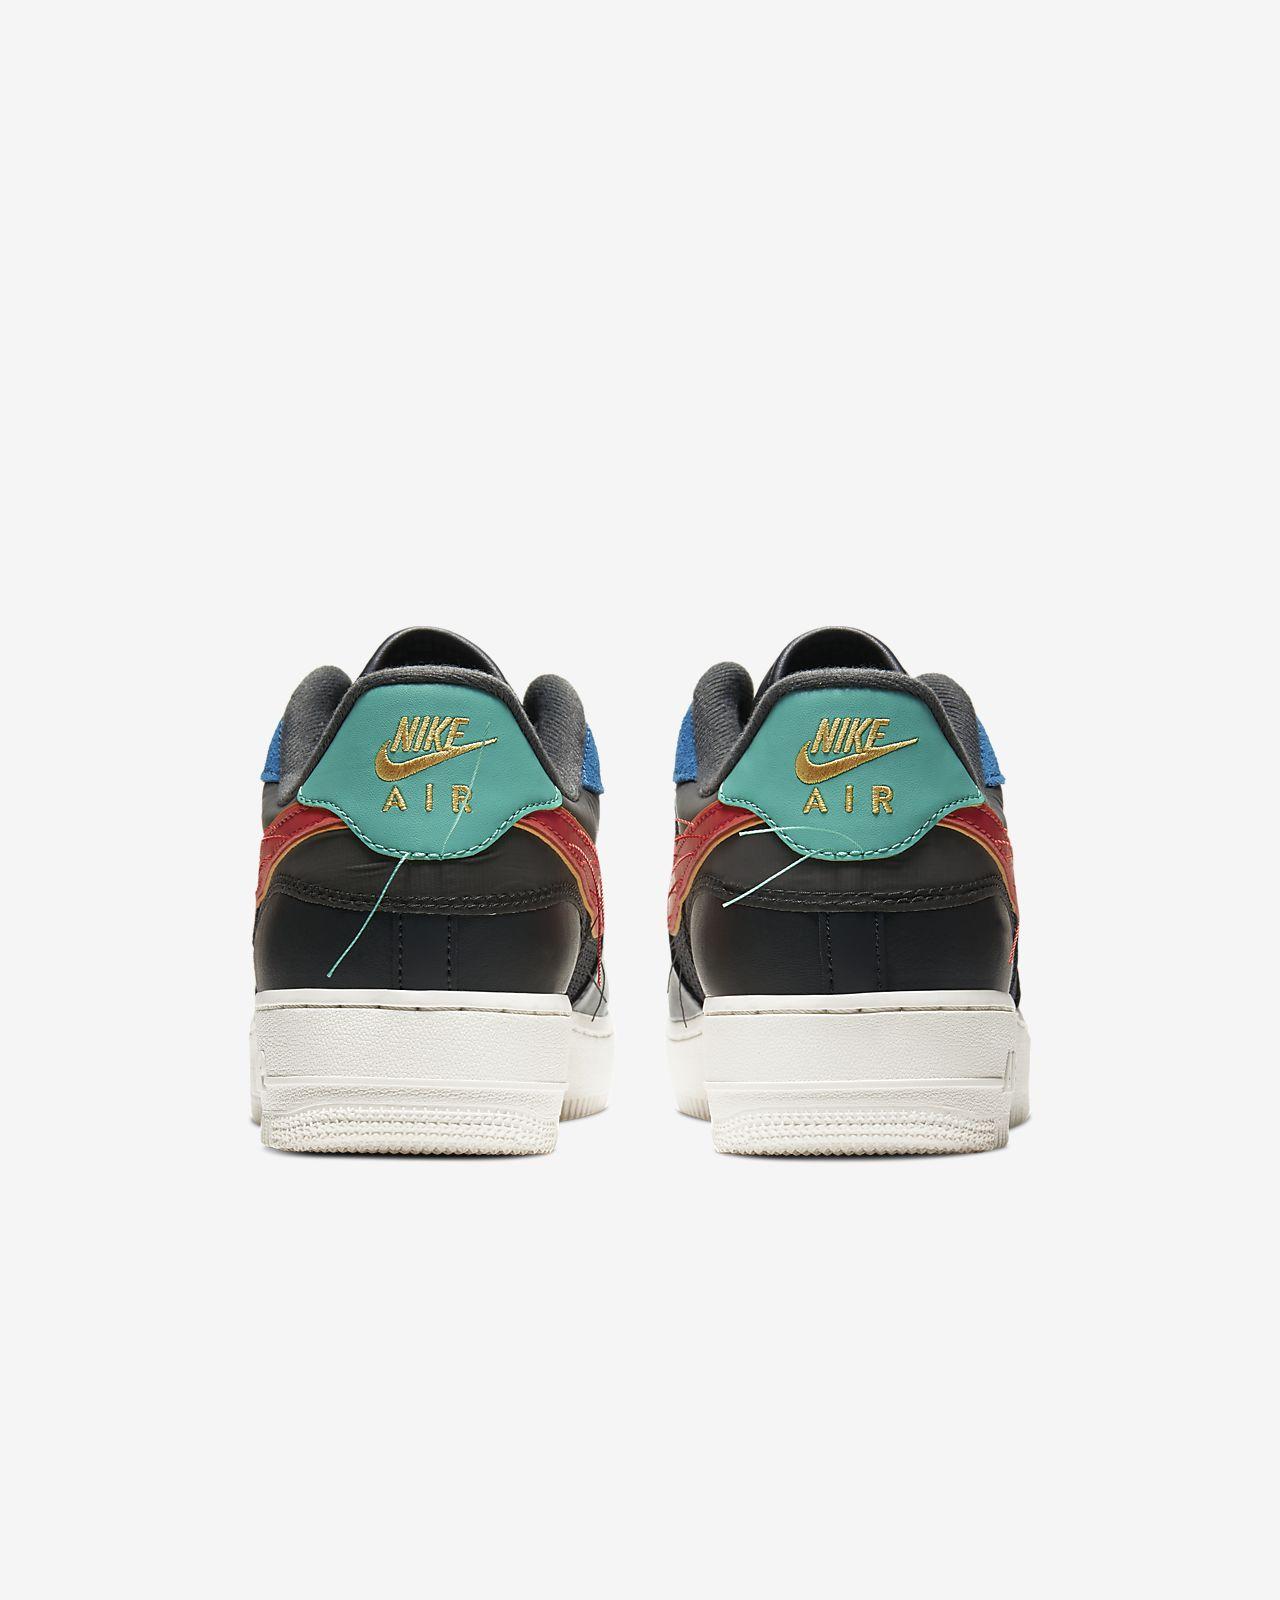 Nike Air Force 1 Low Black History Month Men's Shoe